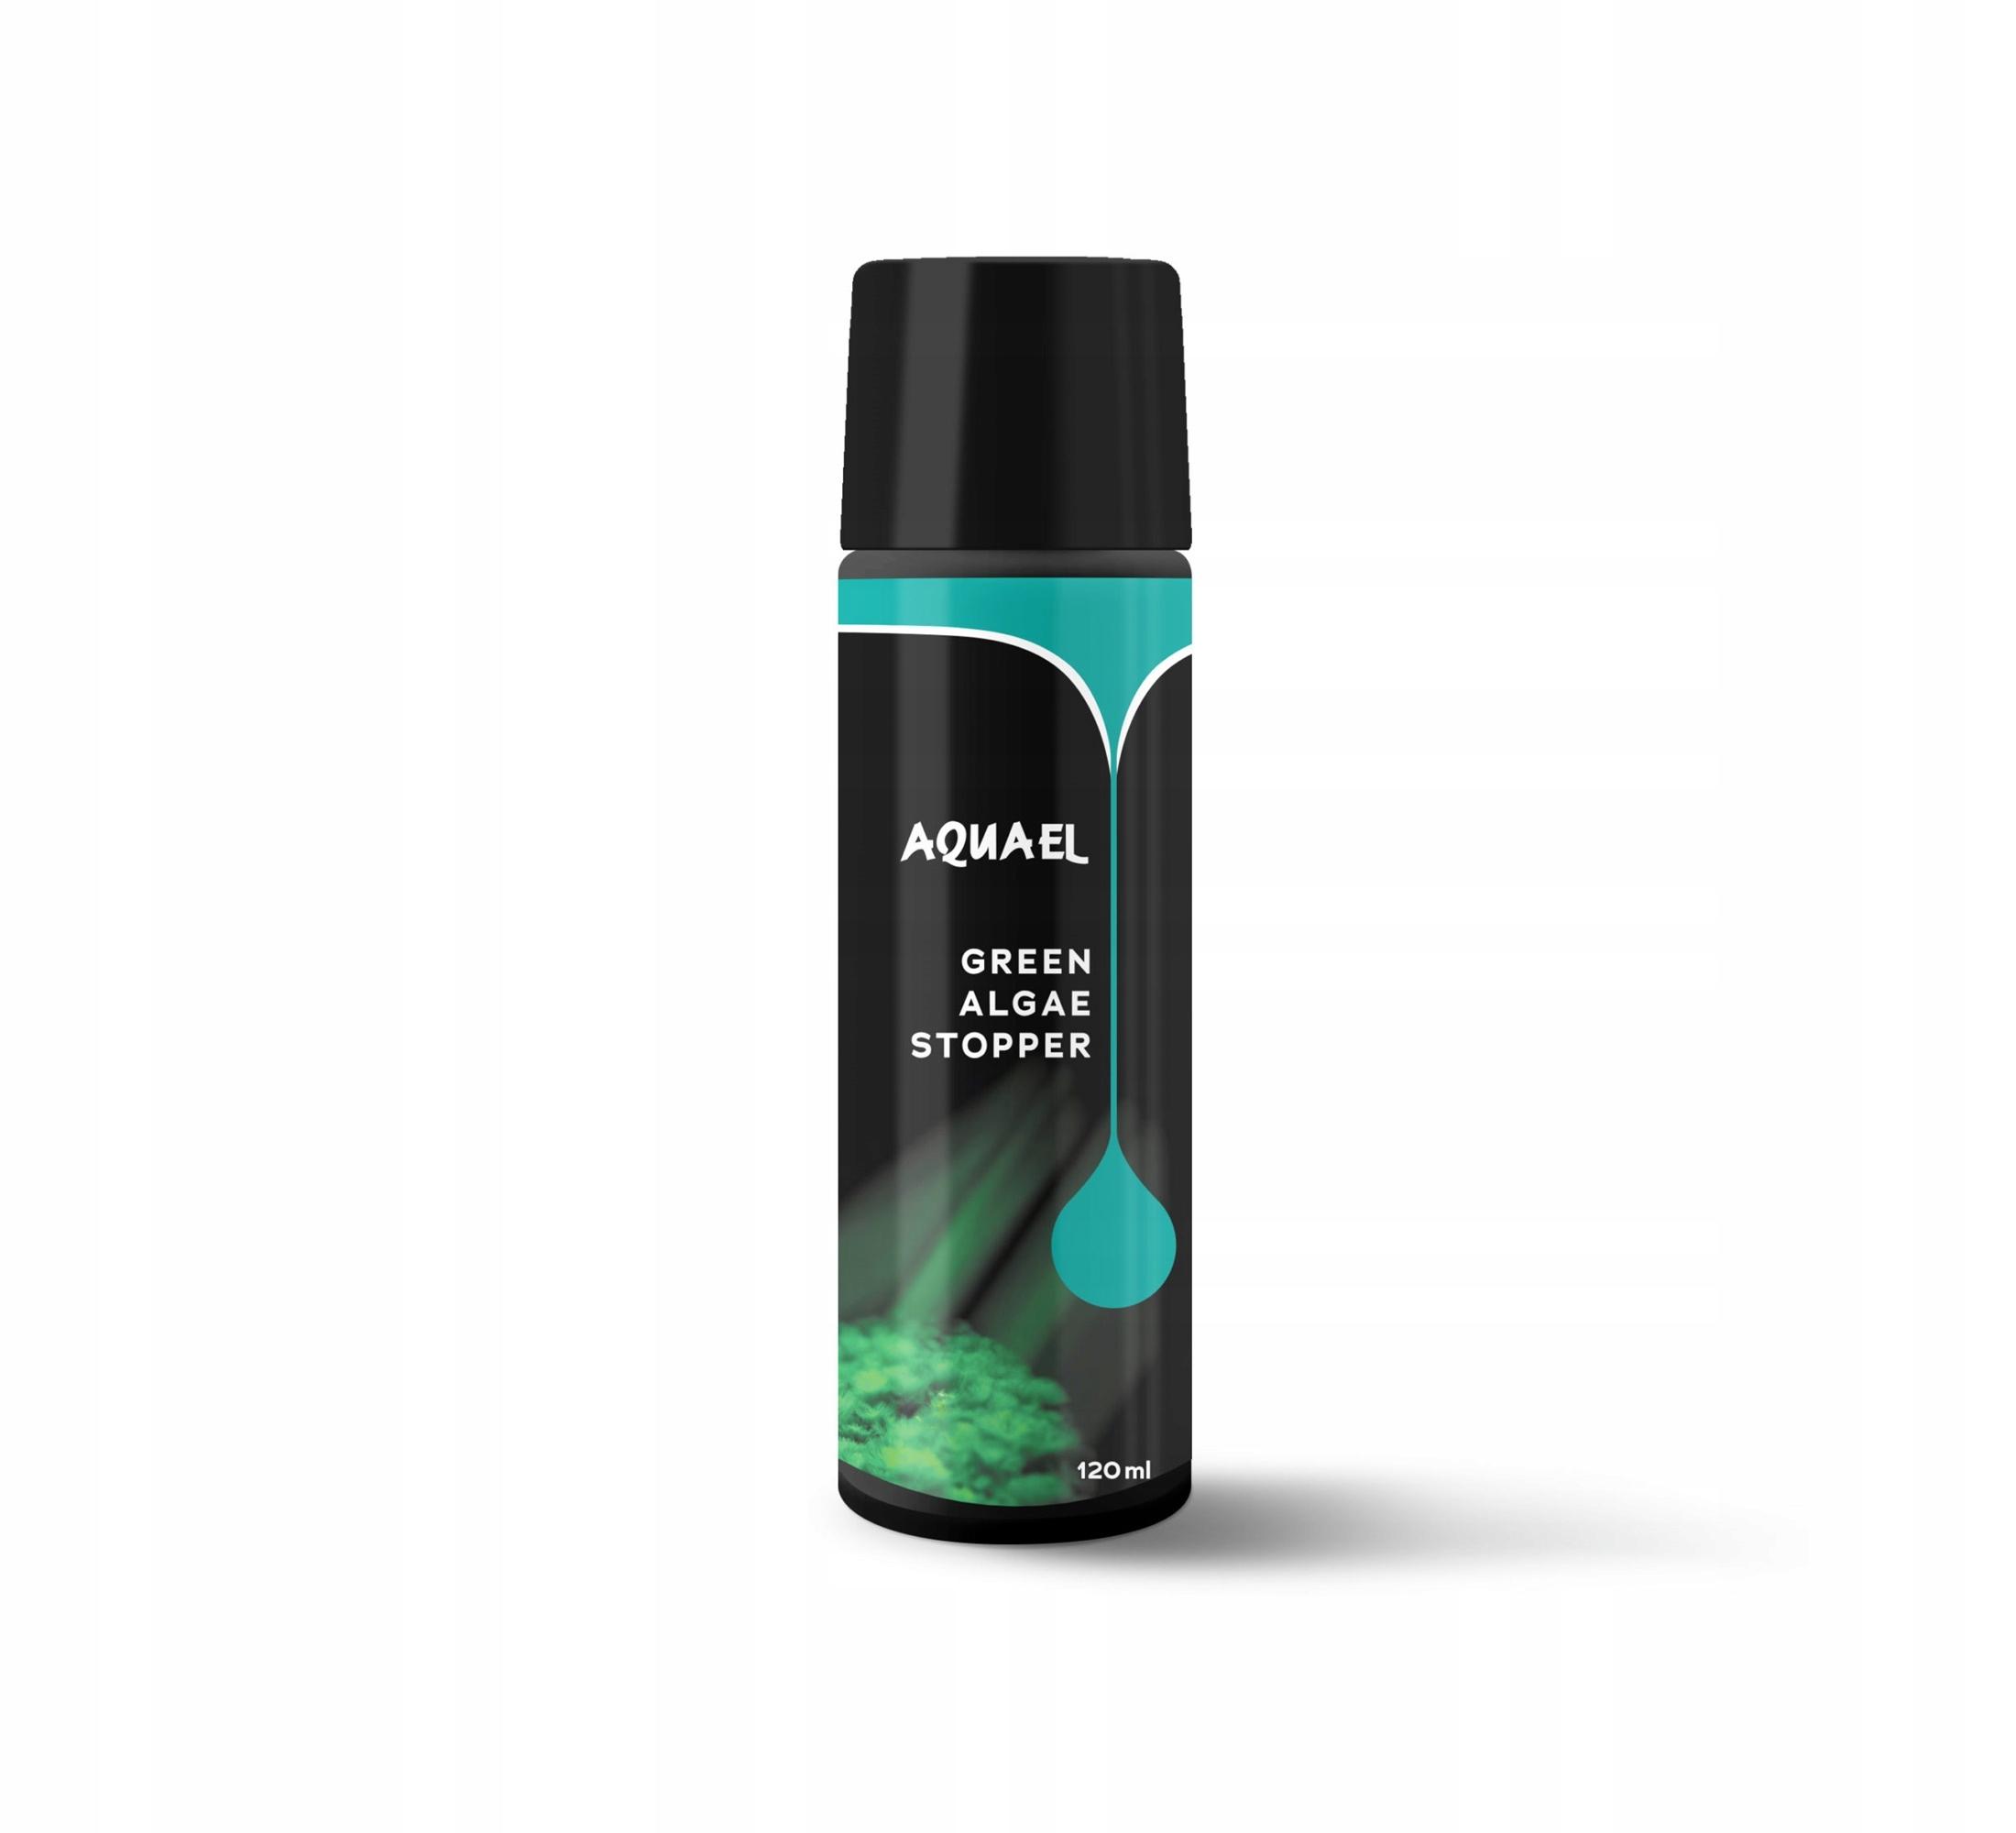 Aquael Green Algae Stopper 120 мл - восстанавливает прилив